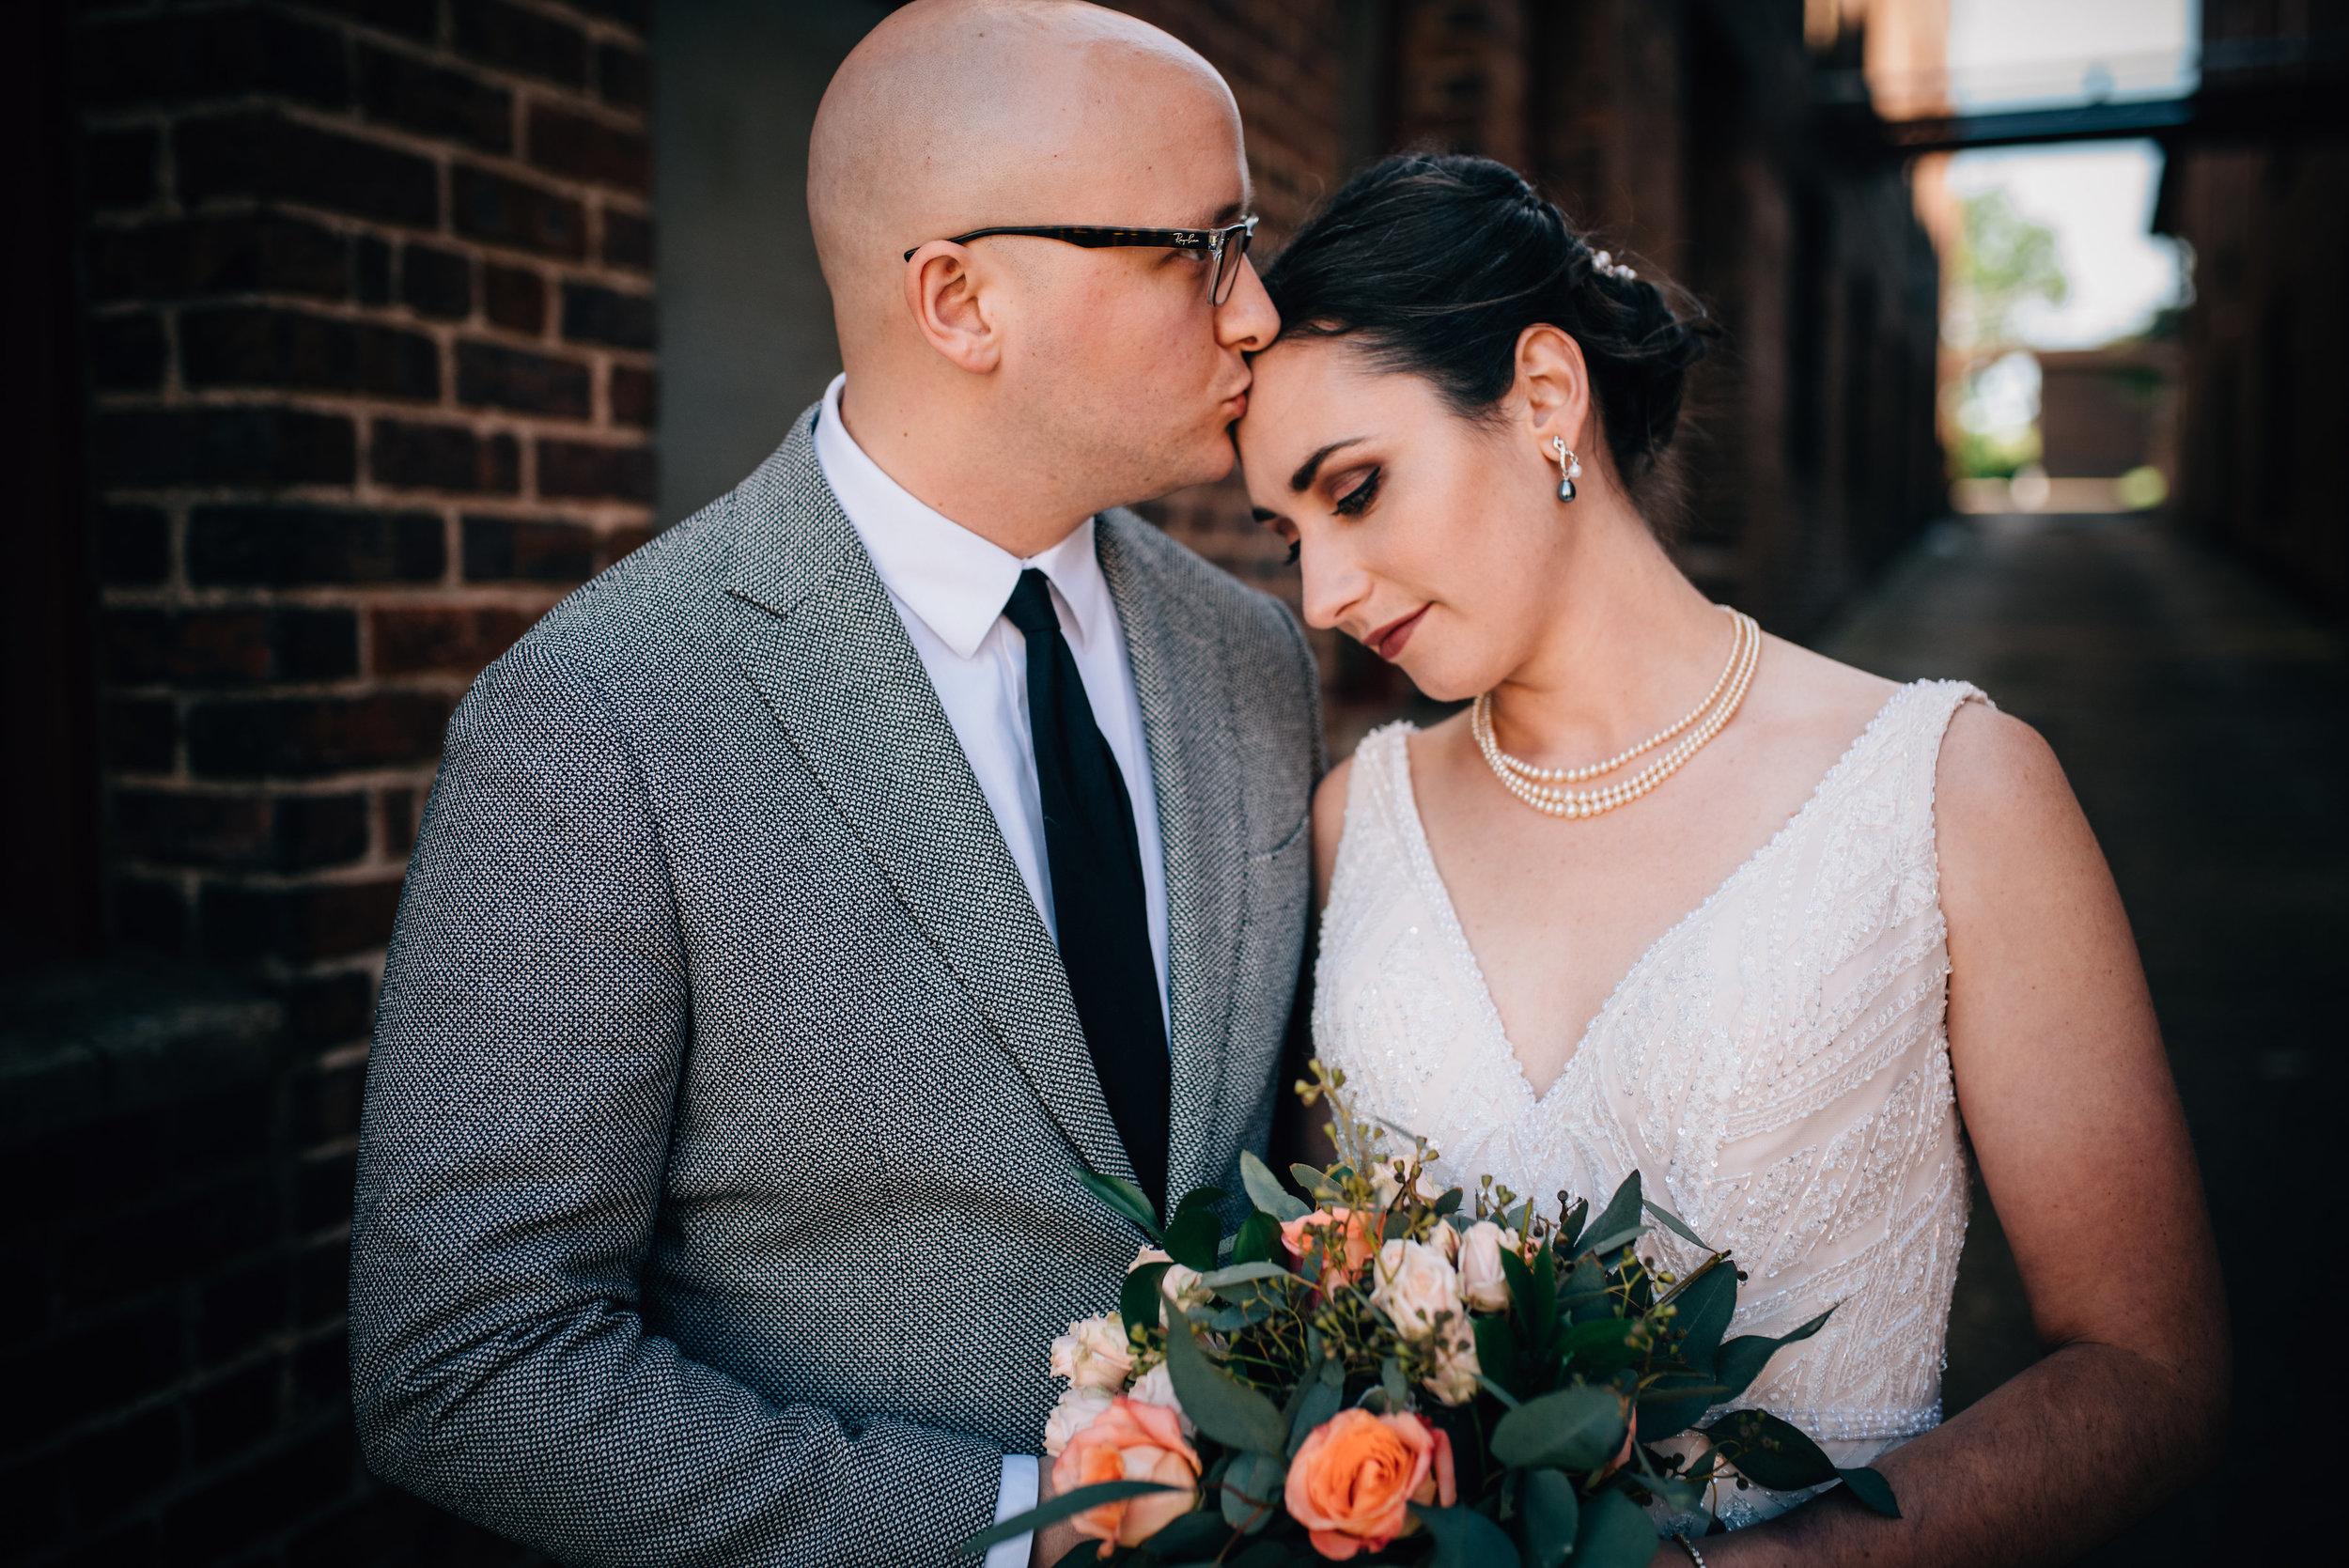 raleigh wedding photographer - north carolina wedding photographer - imurj raleigh wedding